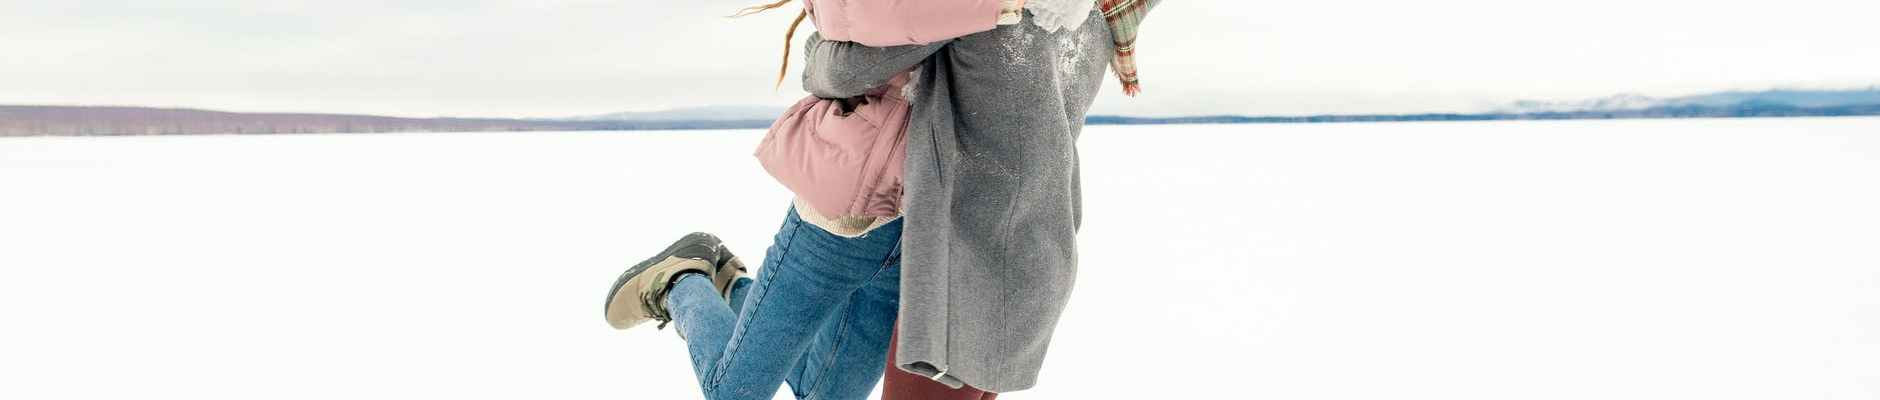 Iscrpni ljubavni horoskop za 2021 godinu, man carrying woman